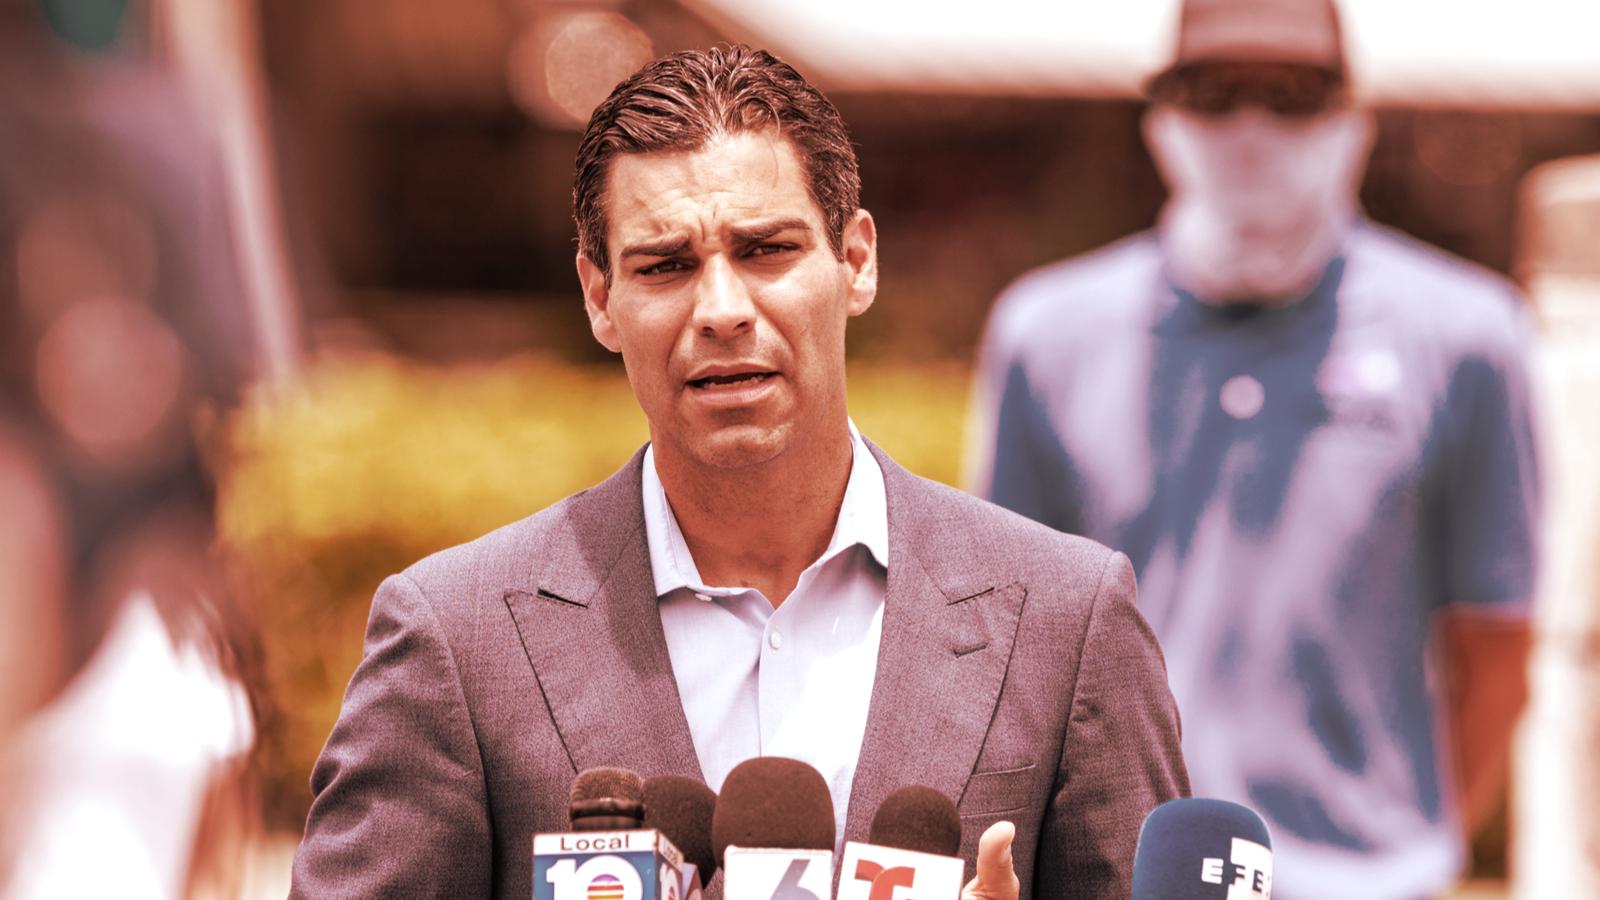 Bitcoin, Like Uber, Is 'Too Big to Regulate': Miami Mayor